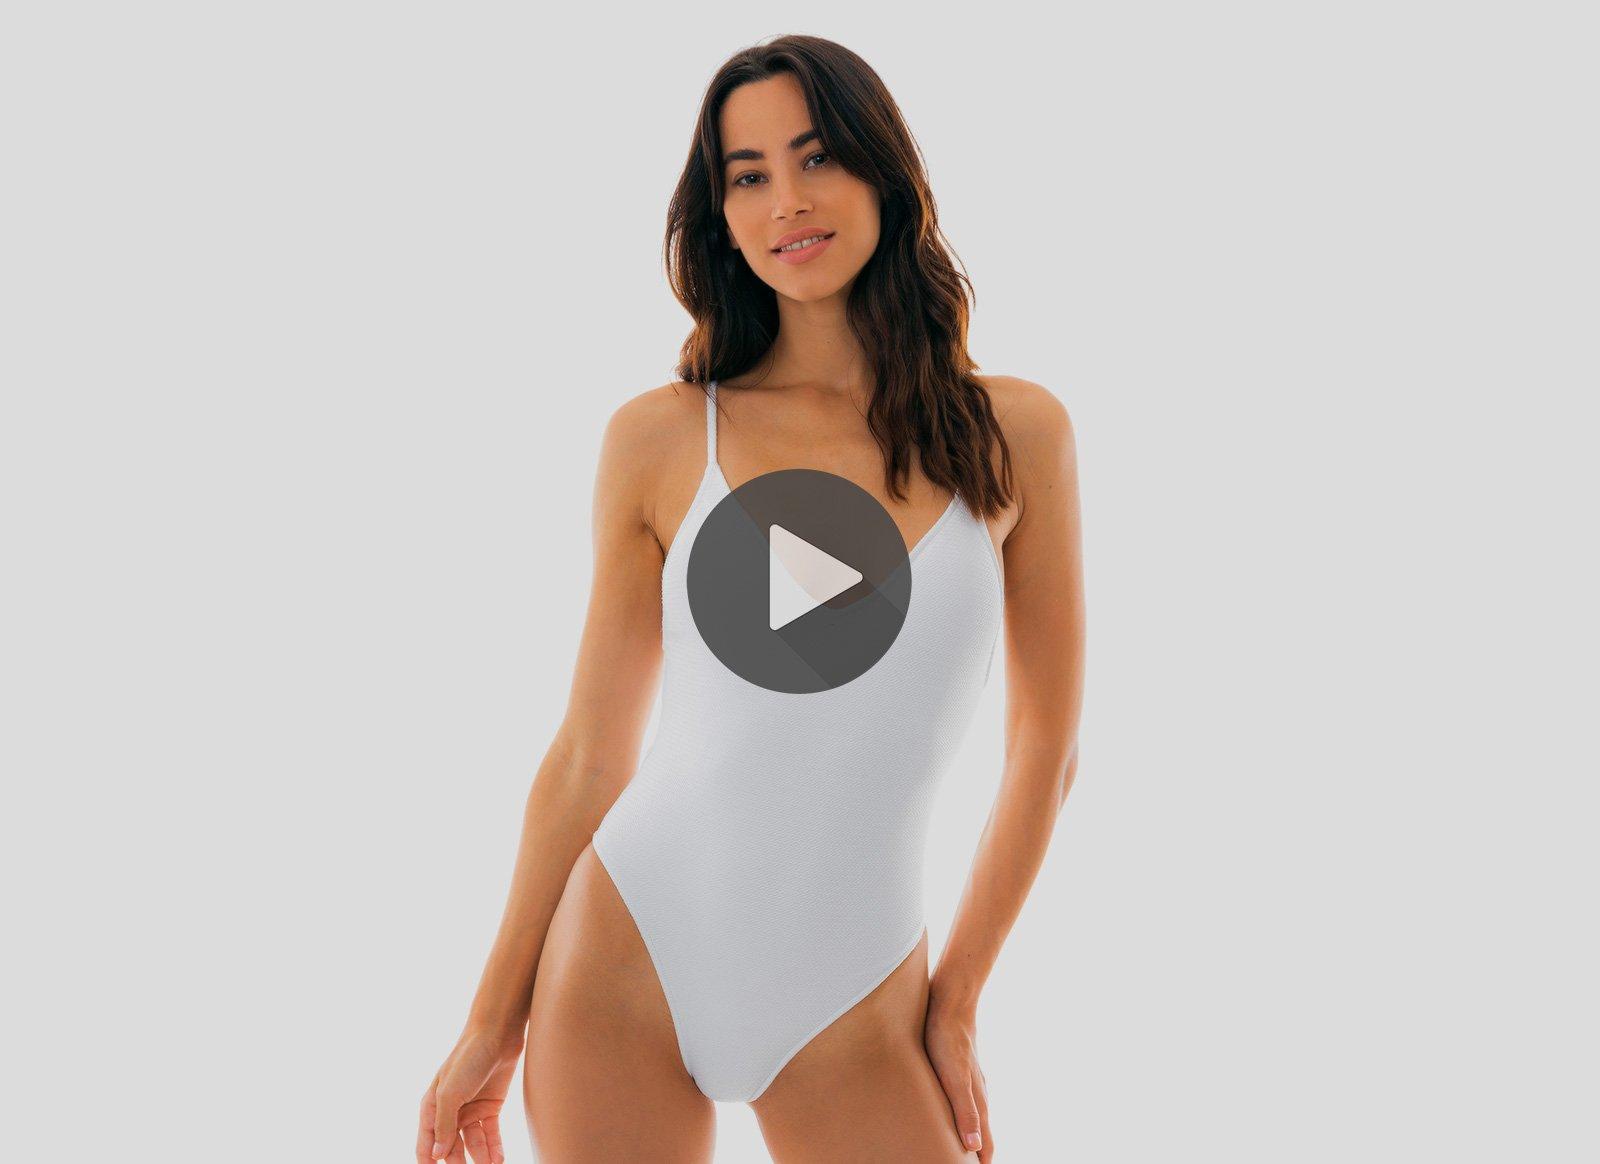 White Swimwear - White Bikini   Swimsuits b3aadeb6bd